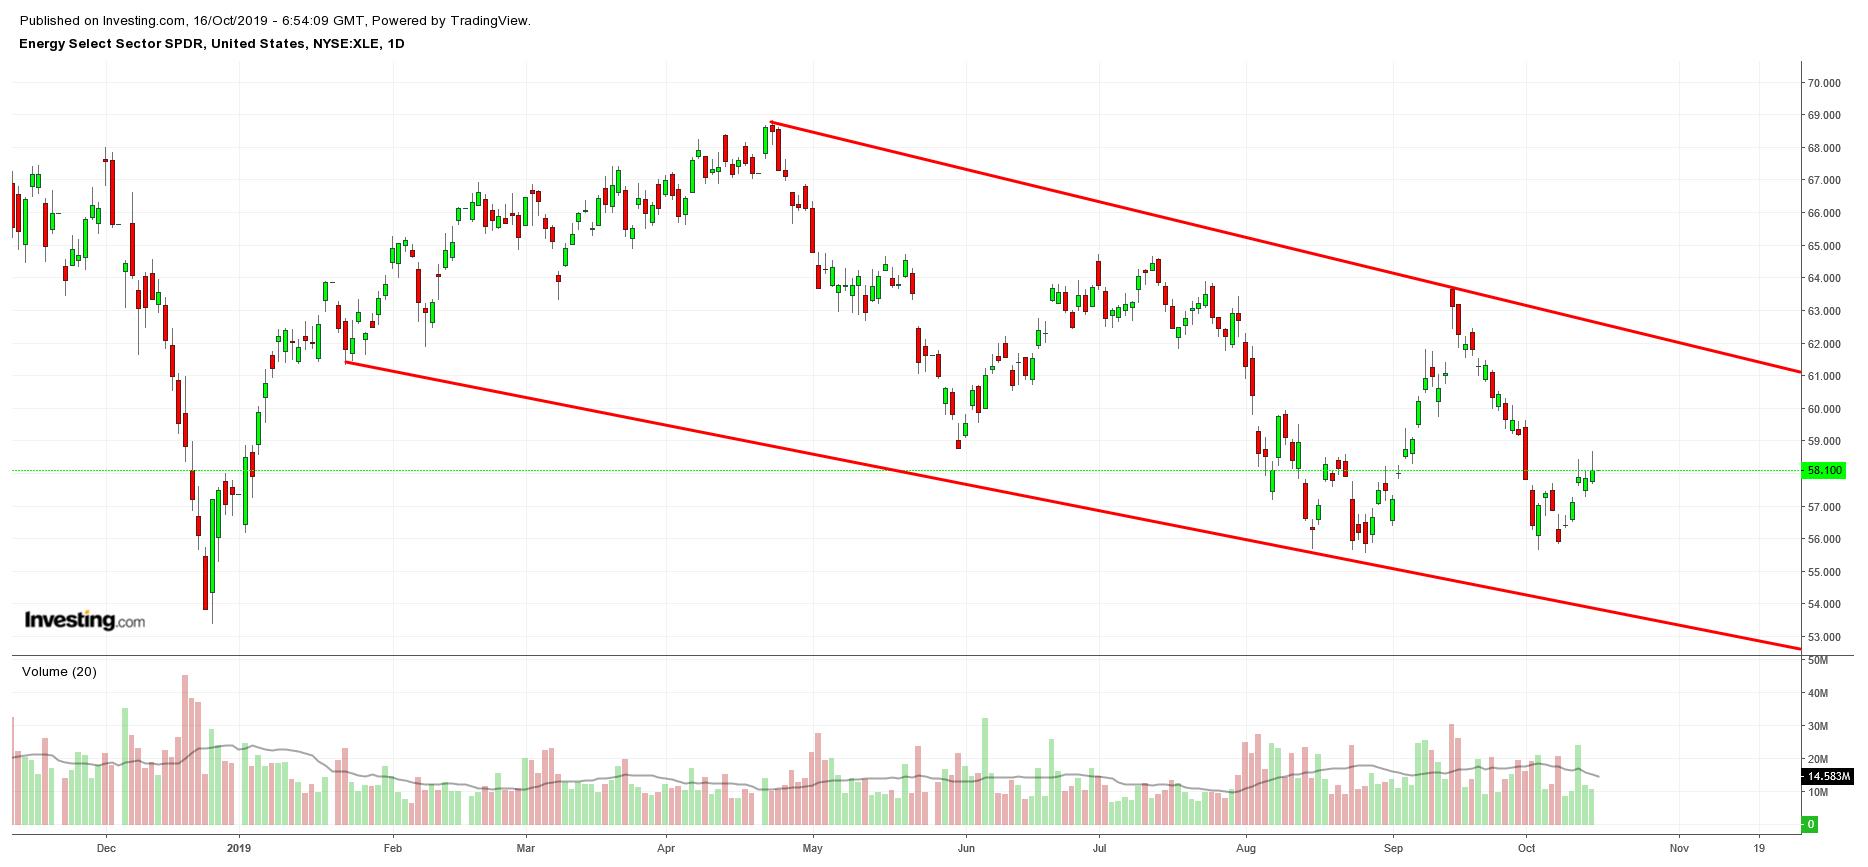 SPDR能源ETF股价走势